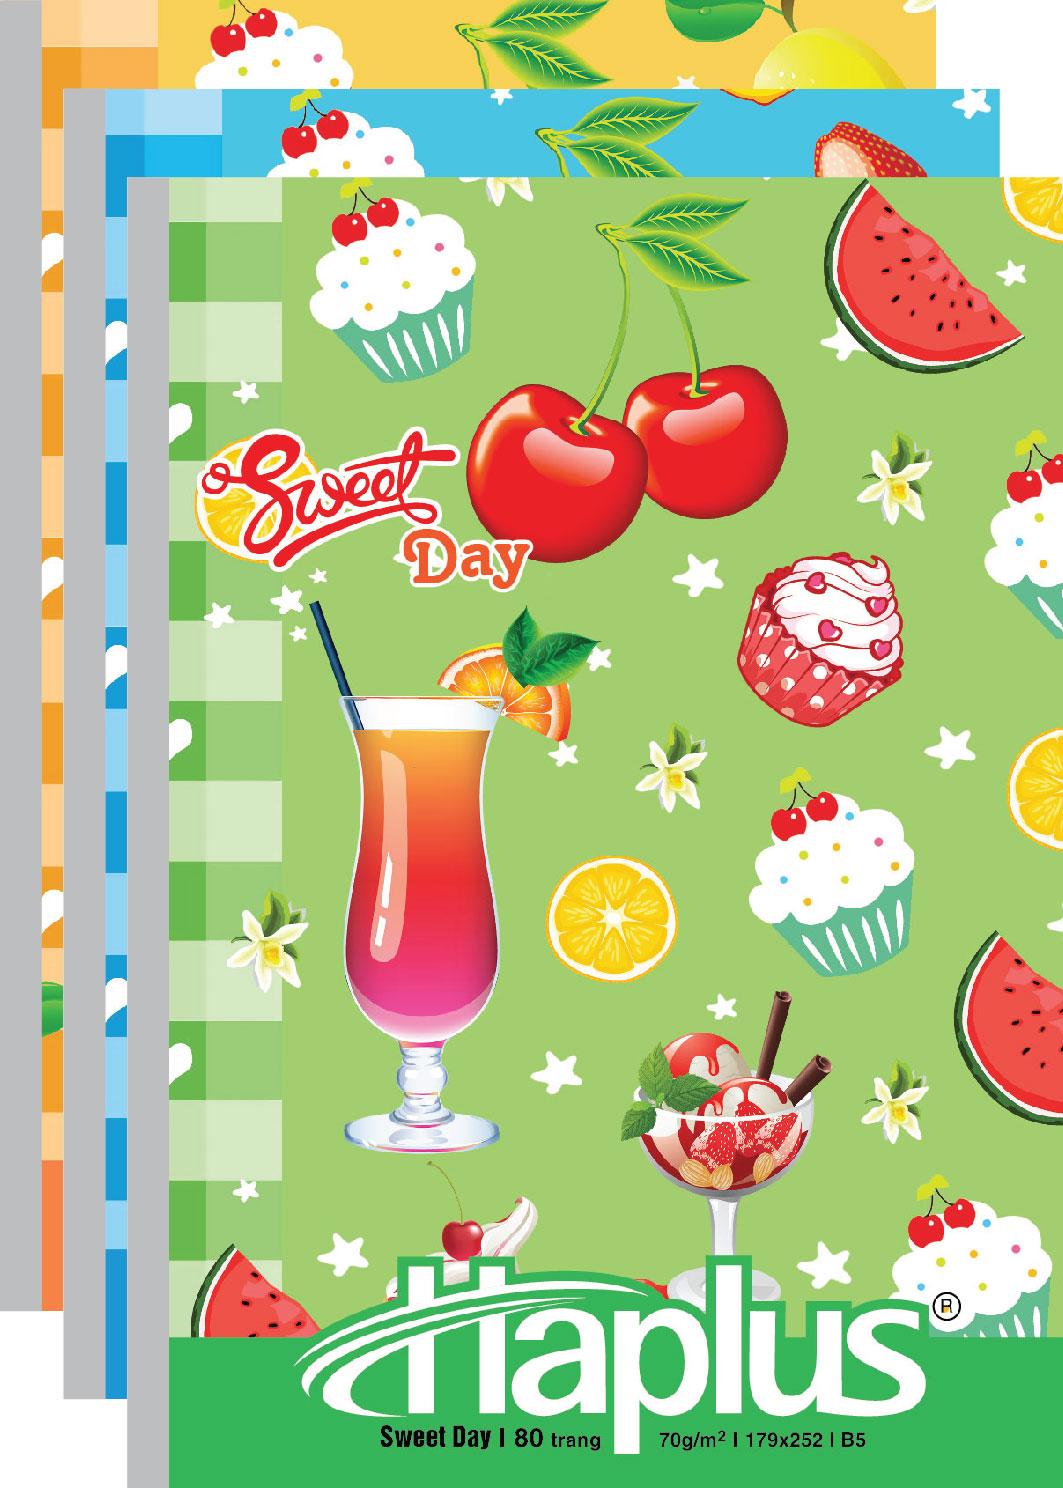 Haplus - Sweet Day